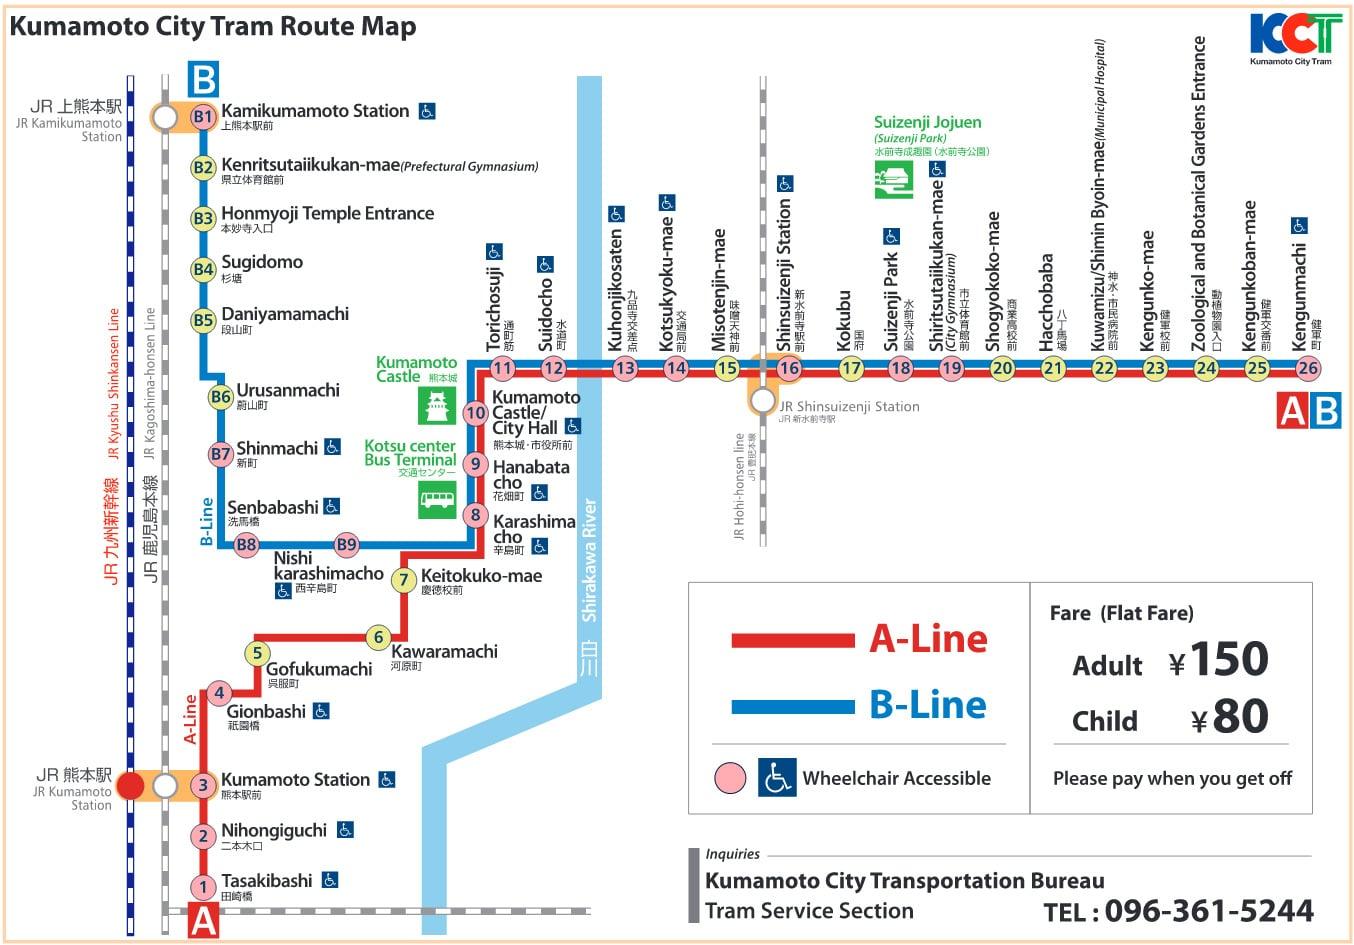 Kumamoto City Tram Map